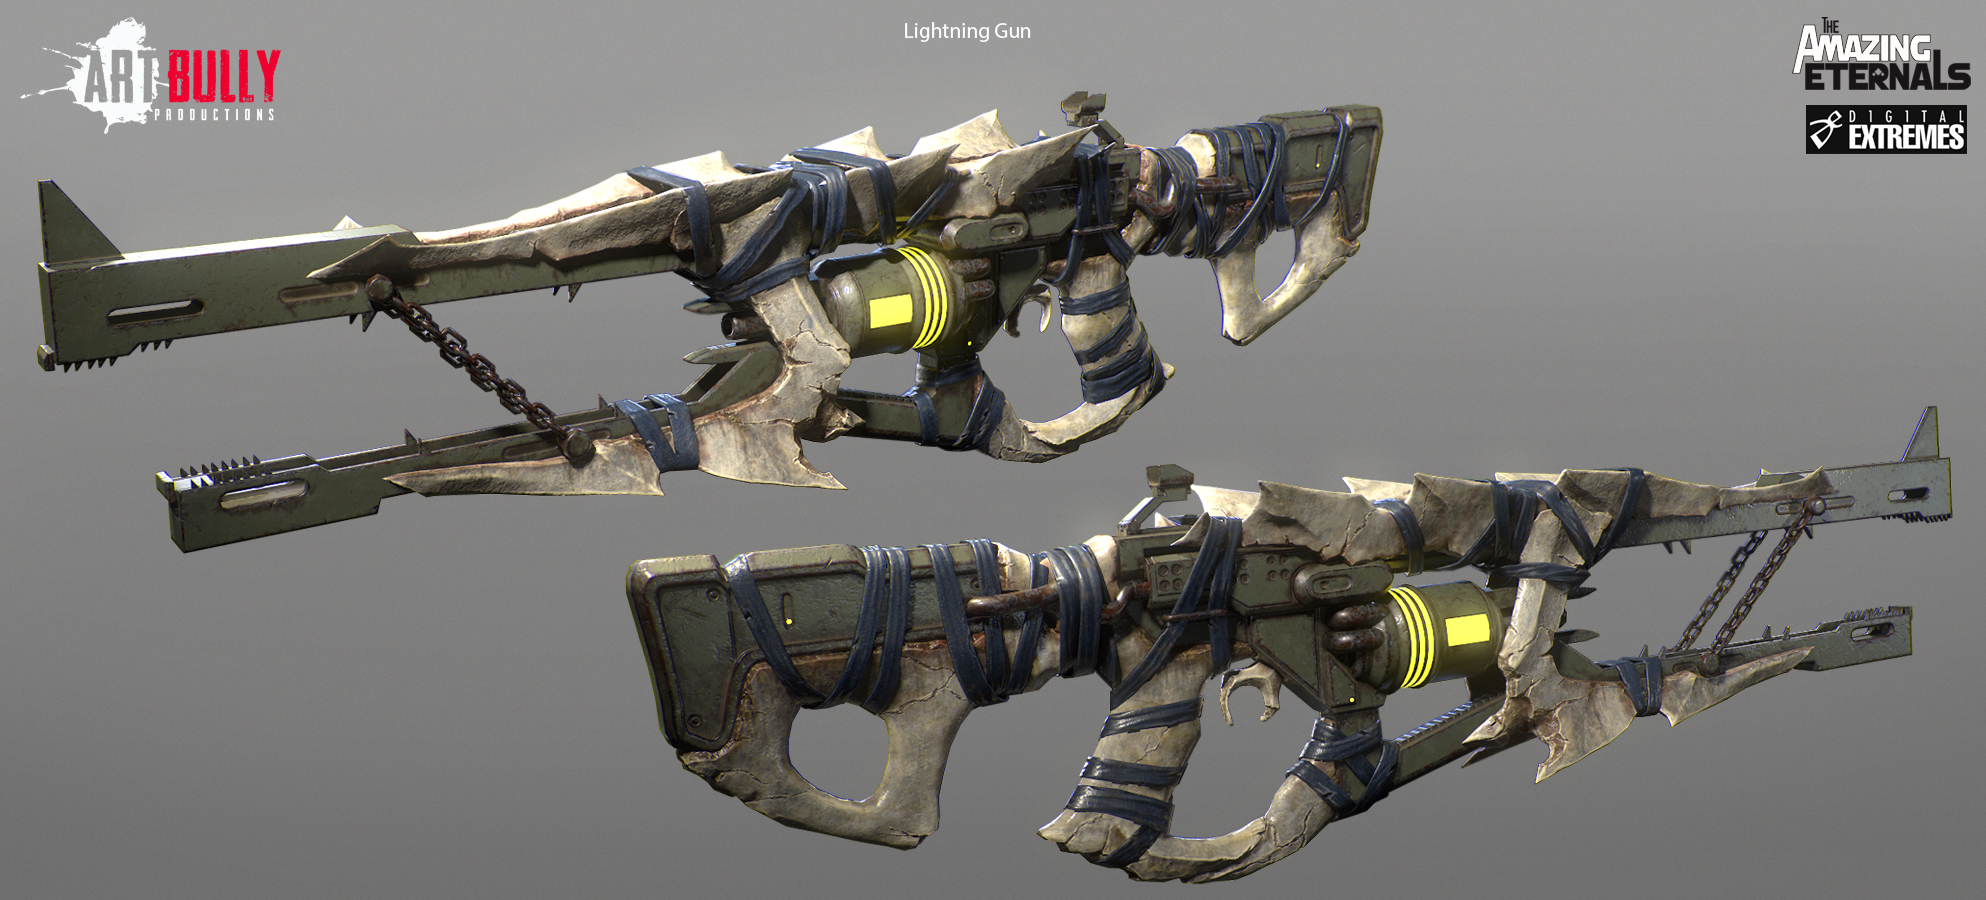 Lightning_Gun_Render.jpg